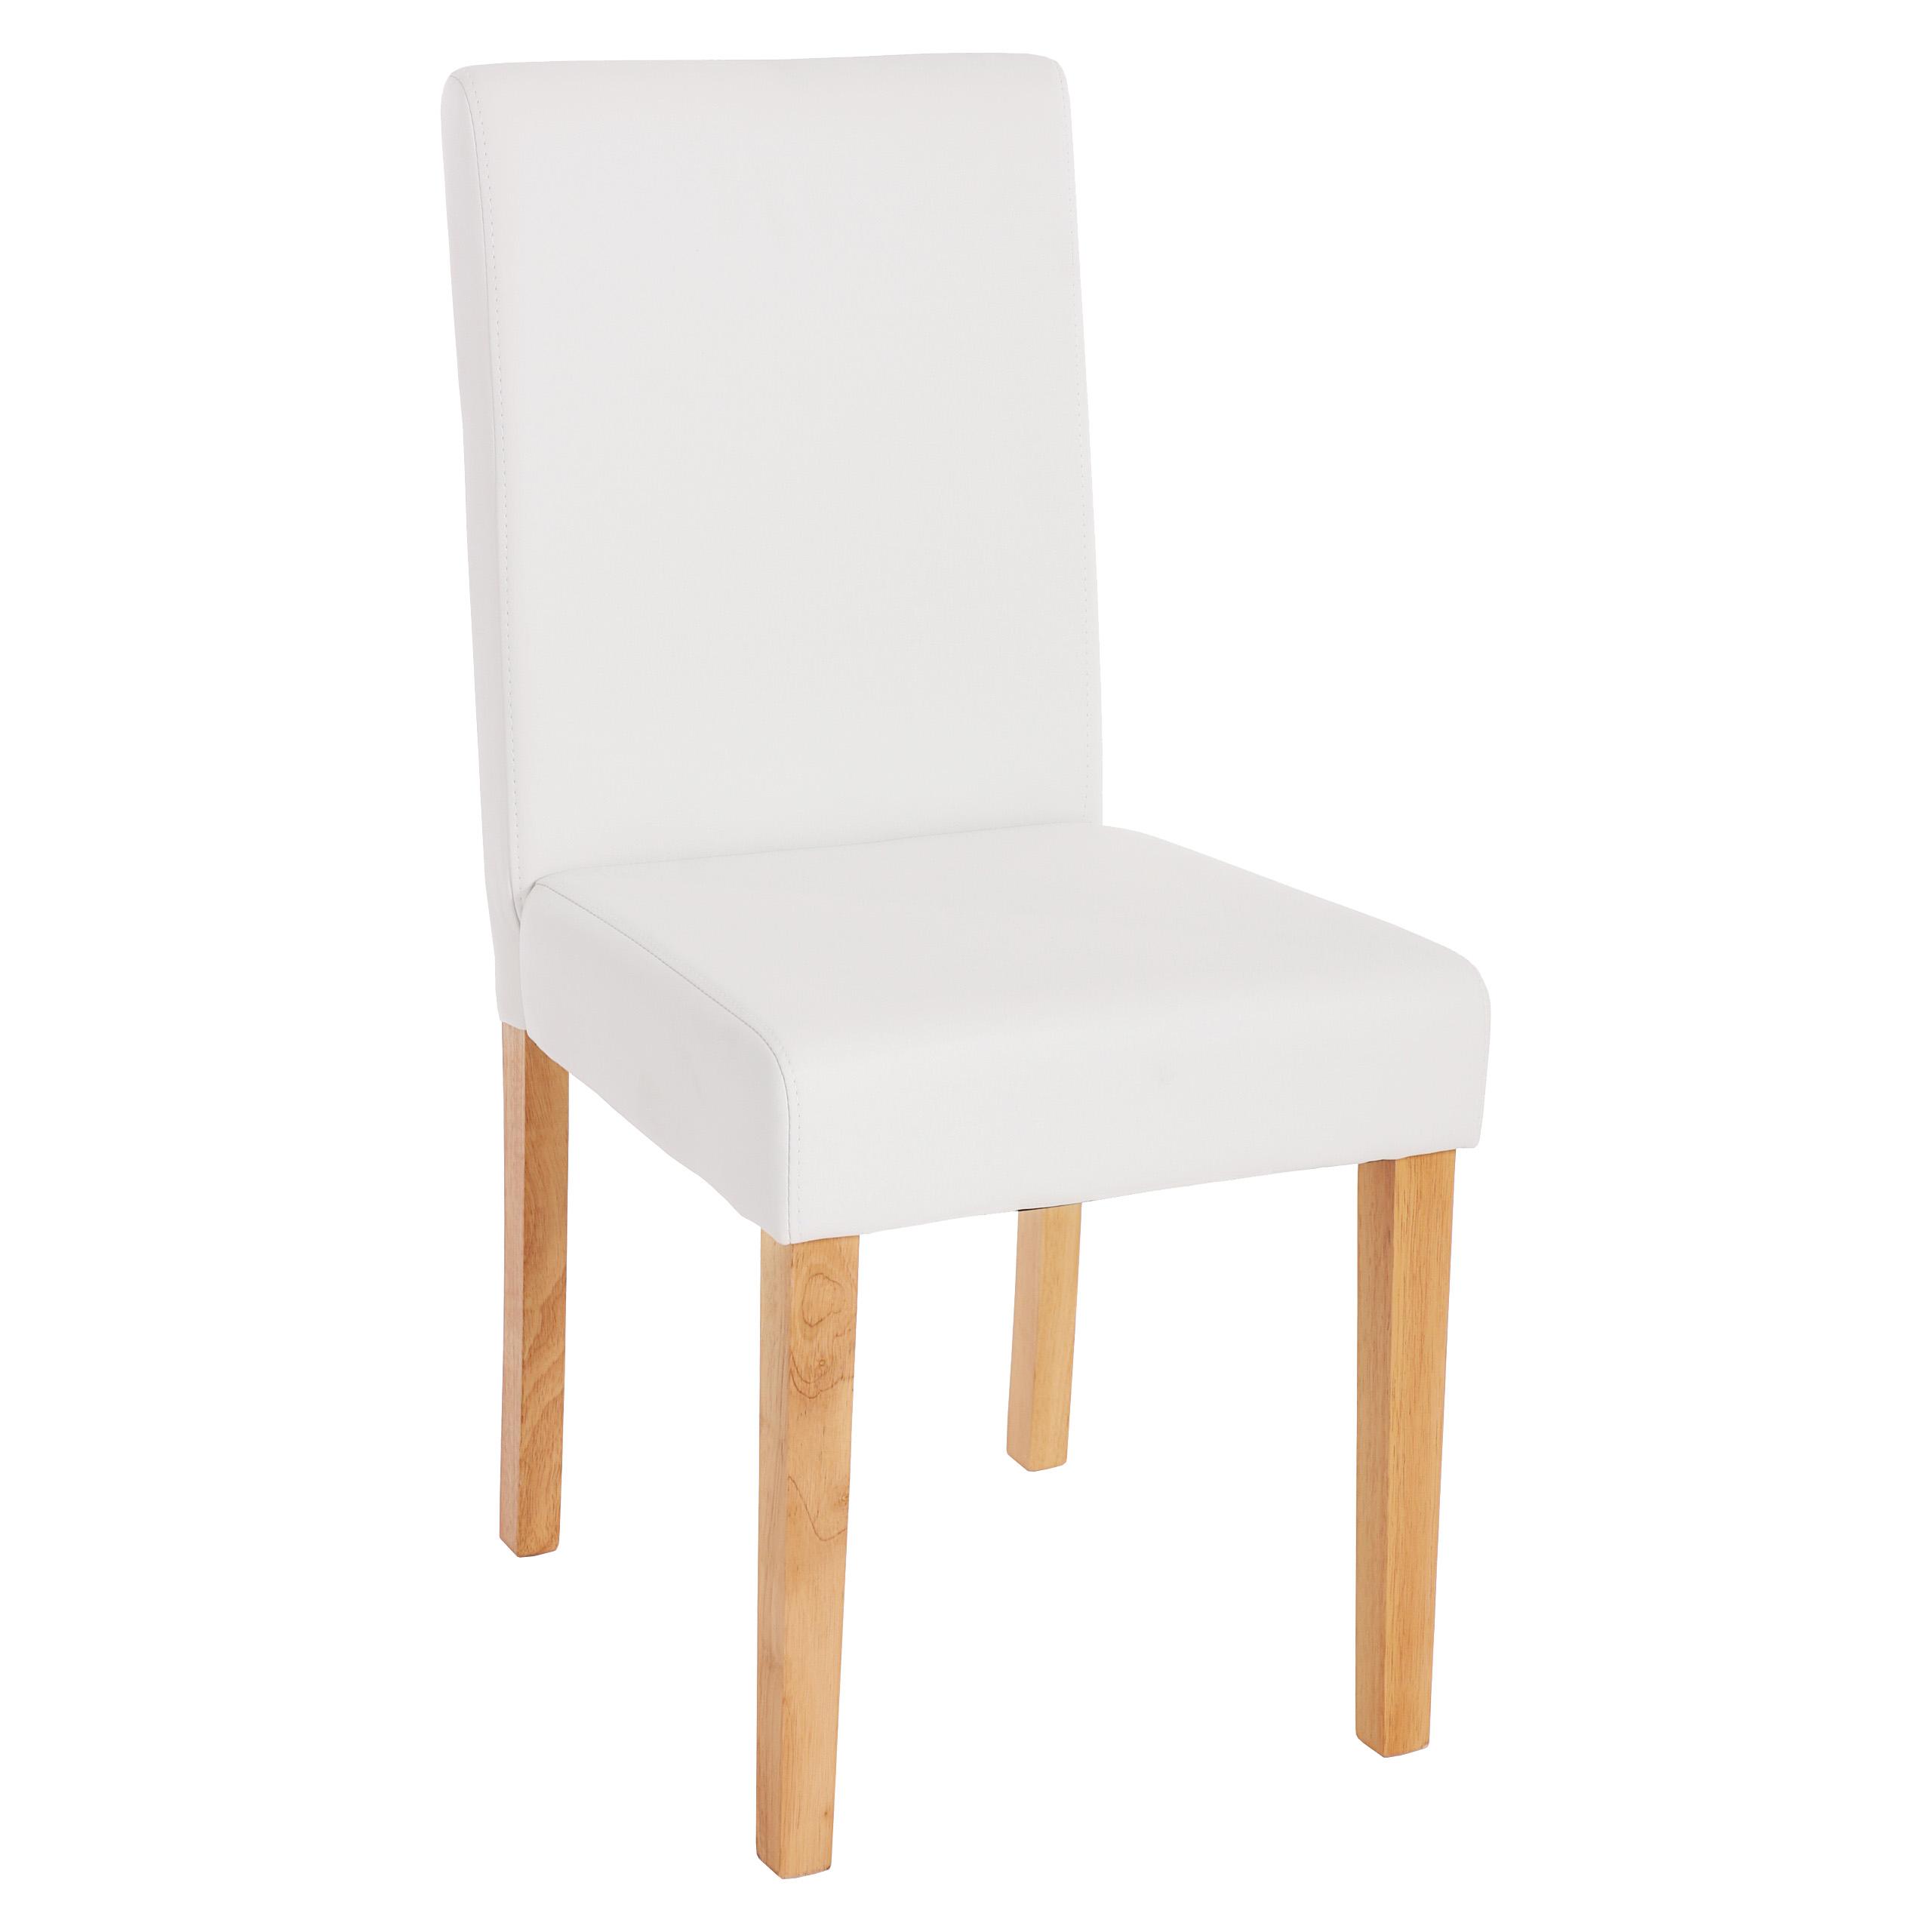 4x esszimmerstuhl stuhl lehnstuhl littau kunstleder wei matt helle beine. Black Bedroom Furniture Sets. Home Design Ideas